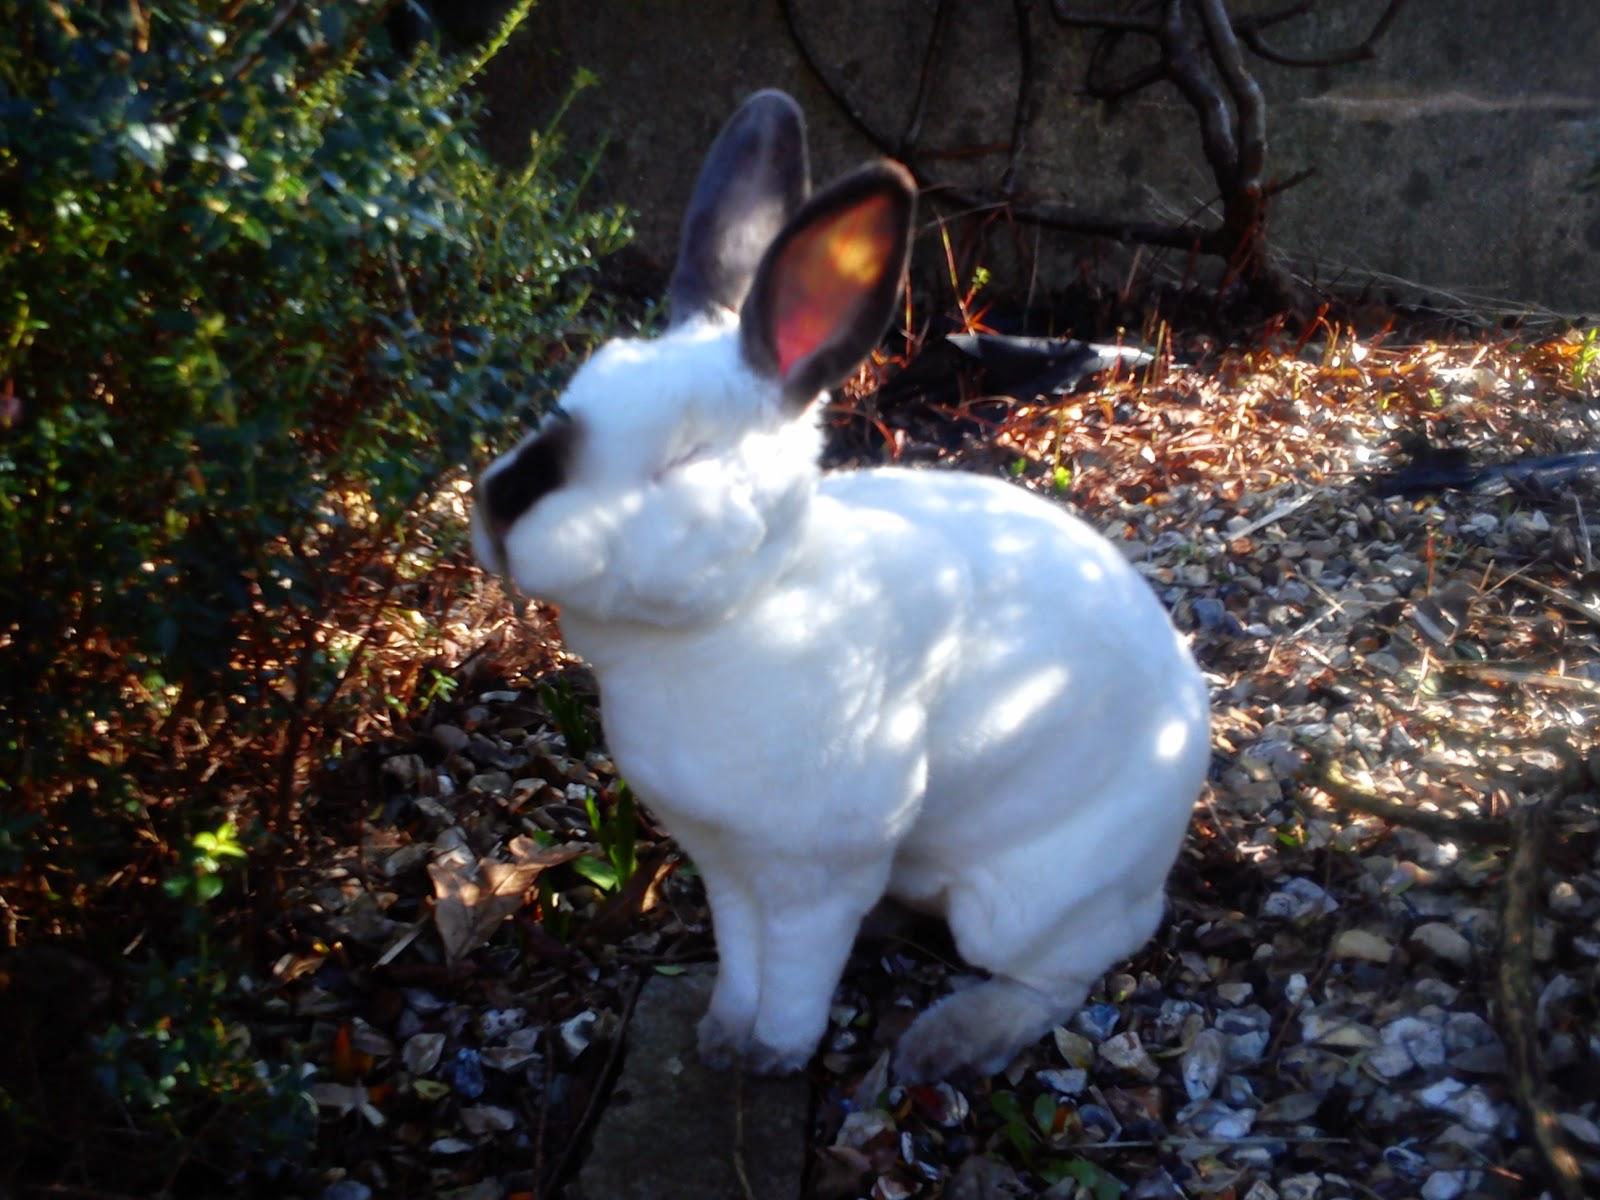 Speedy the cheeky house bunny: Sunday Selfie    its a lovely